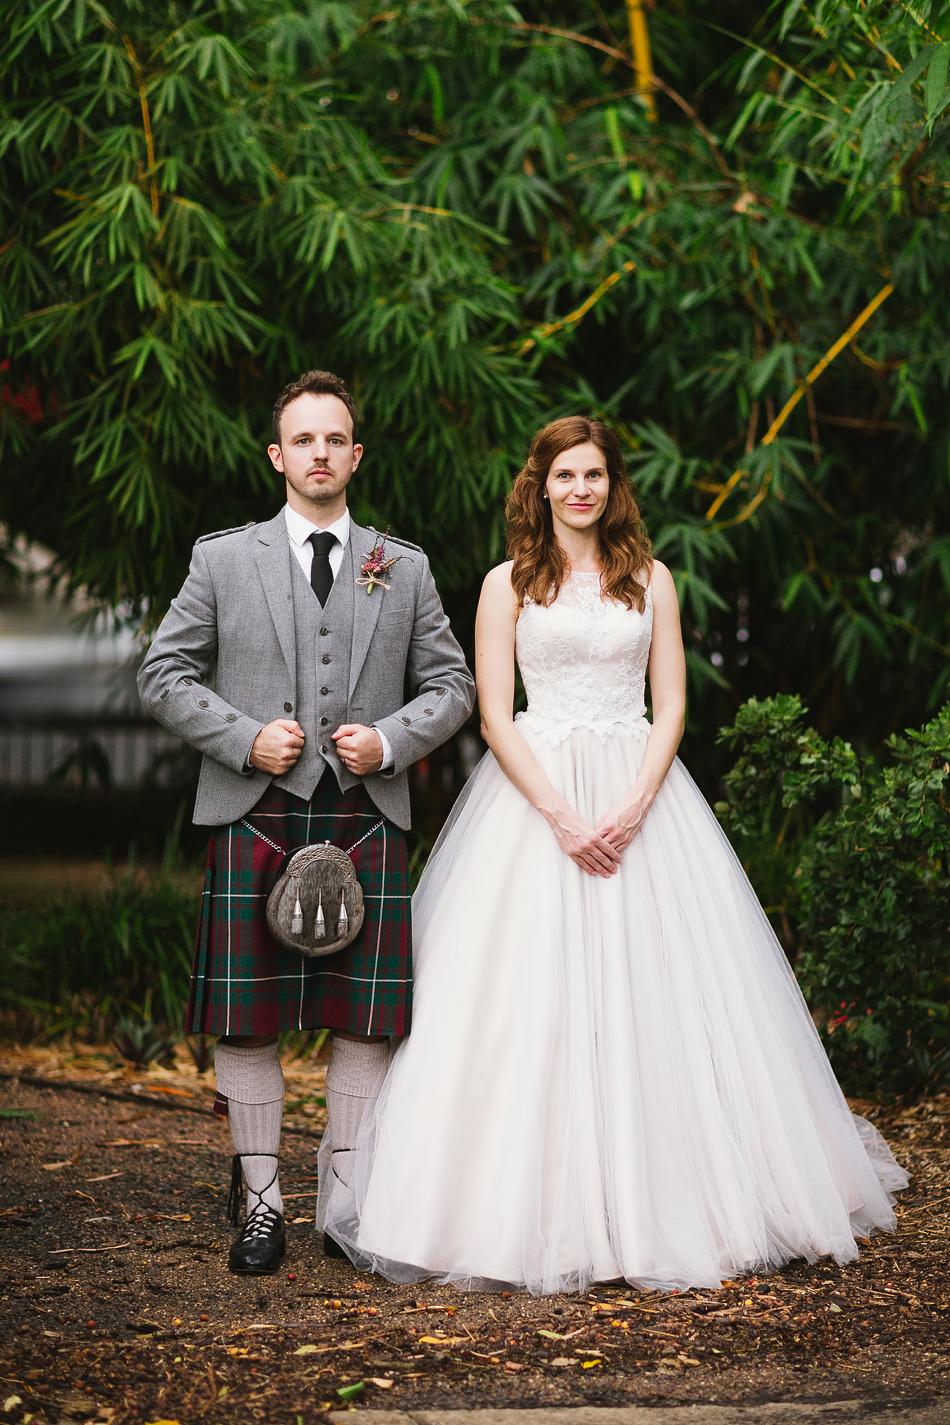 Cool Wedding Photographer Brisbane Outdooor Botanical Gardens